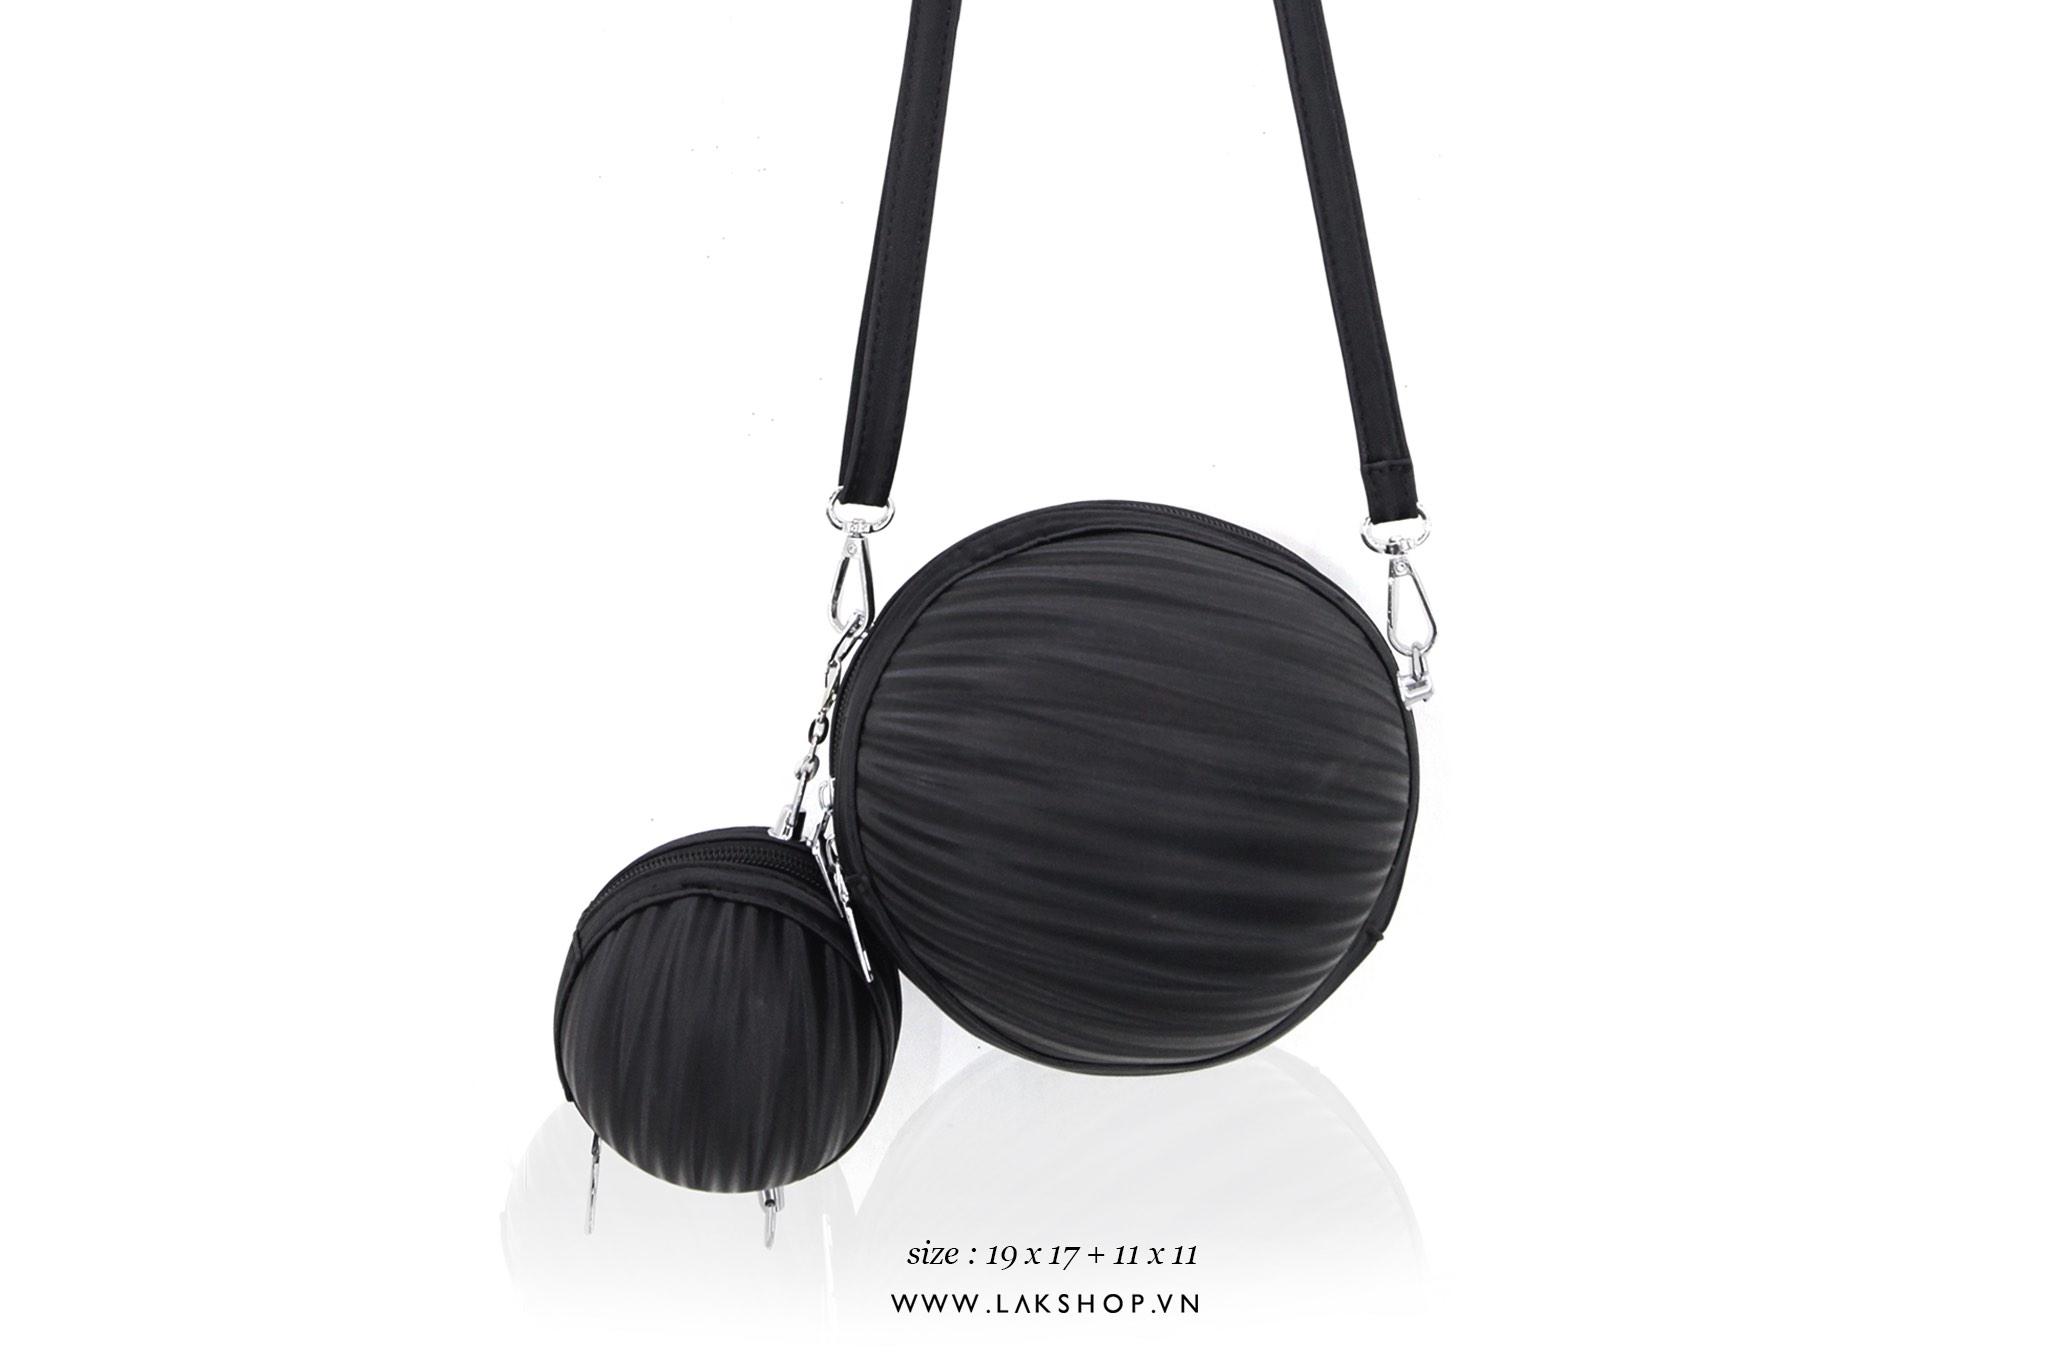 Louis Vuitton Chain Plain Leather Loafers Chain Plain Leather